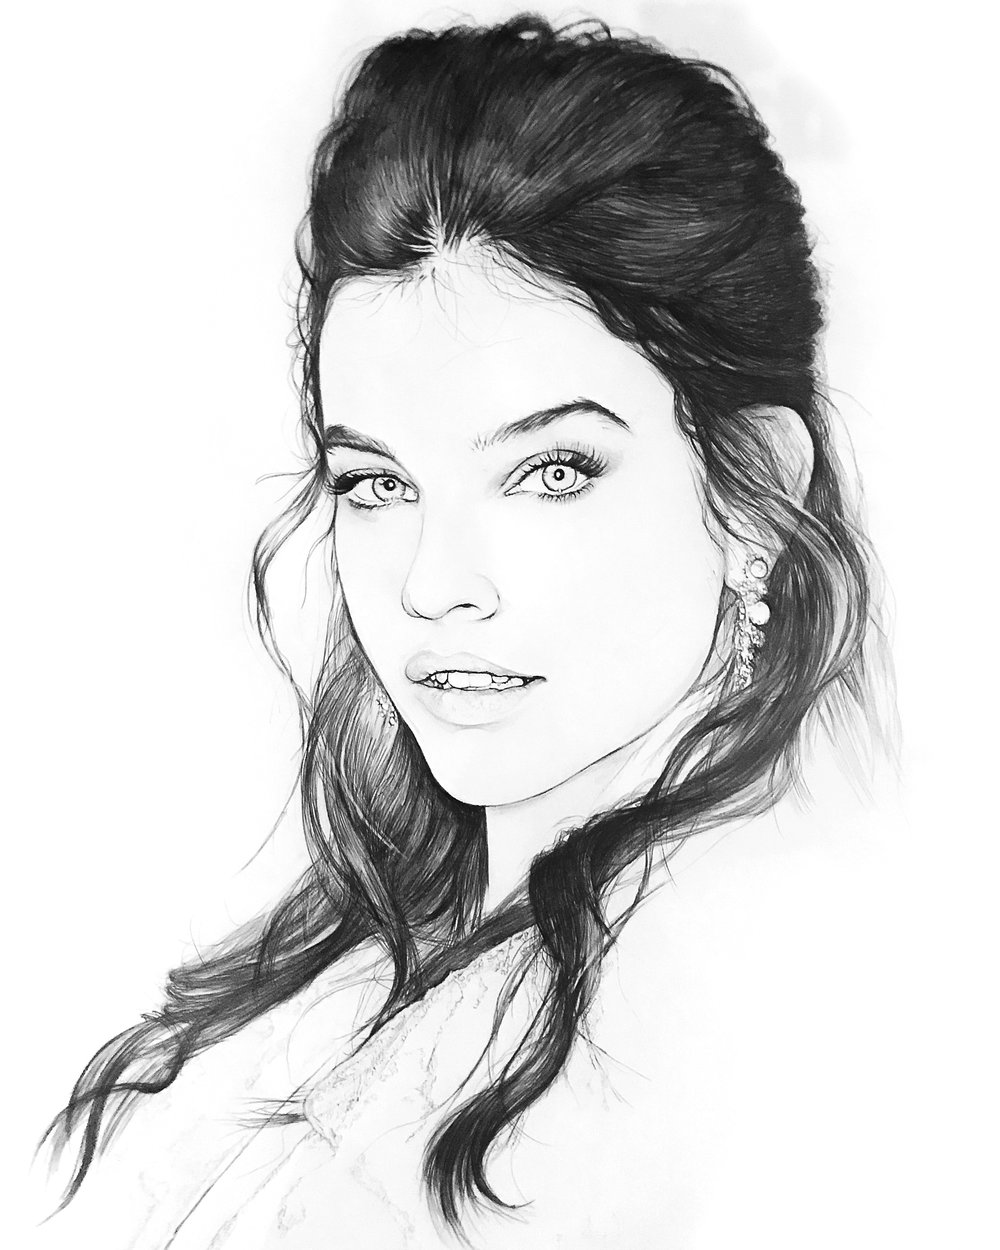 BBKUNST-Art-Artist-Bryan-Barnes-Pencil-Drawings-Art-beautiful-pretty-hyper-realistic-best-Drawing_Barbara_Palvin_artwork-fashion-model-Barbara-2_020718.jpg